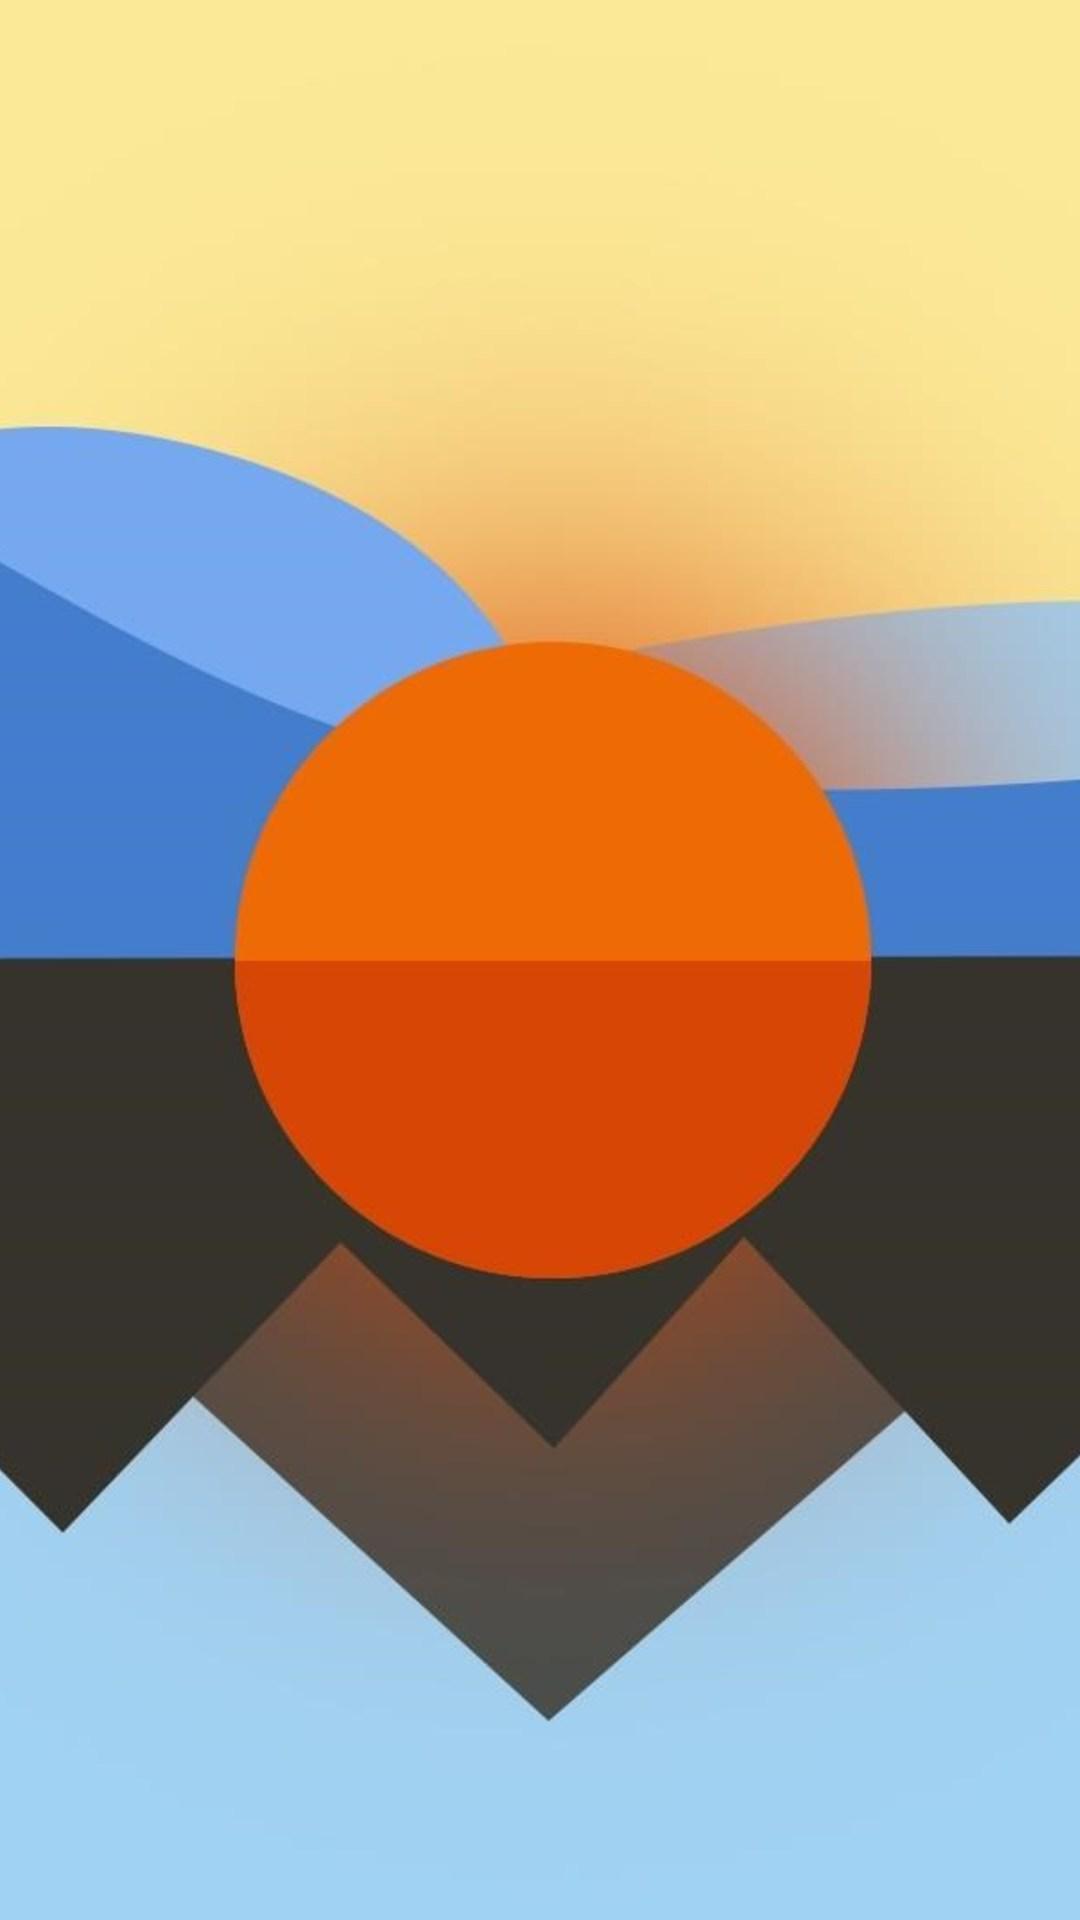 Google Pixel Wallpapers HD